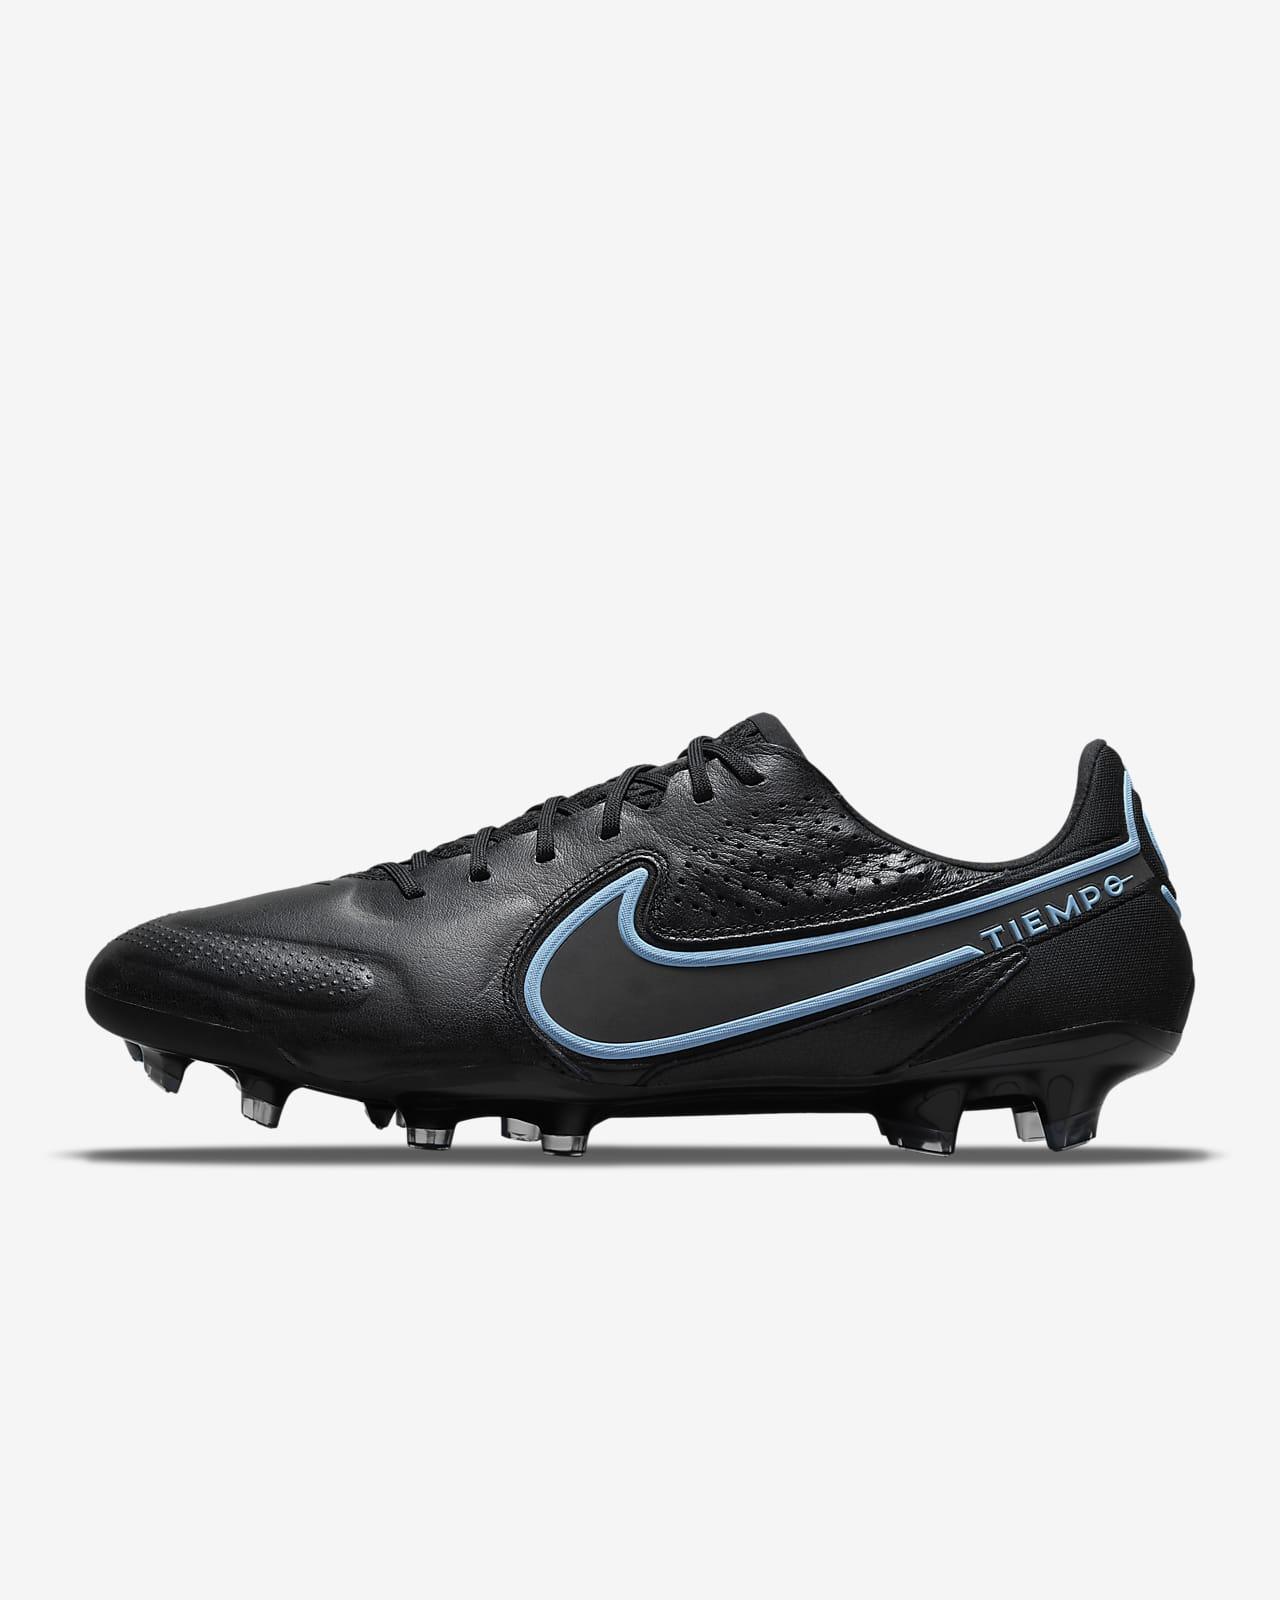 Calzado de fútbol para terreno firme Nike Tiempo Legend 9 Elite FG